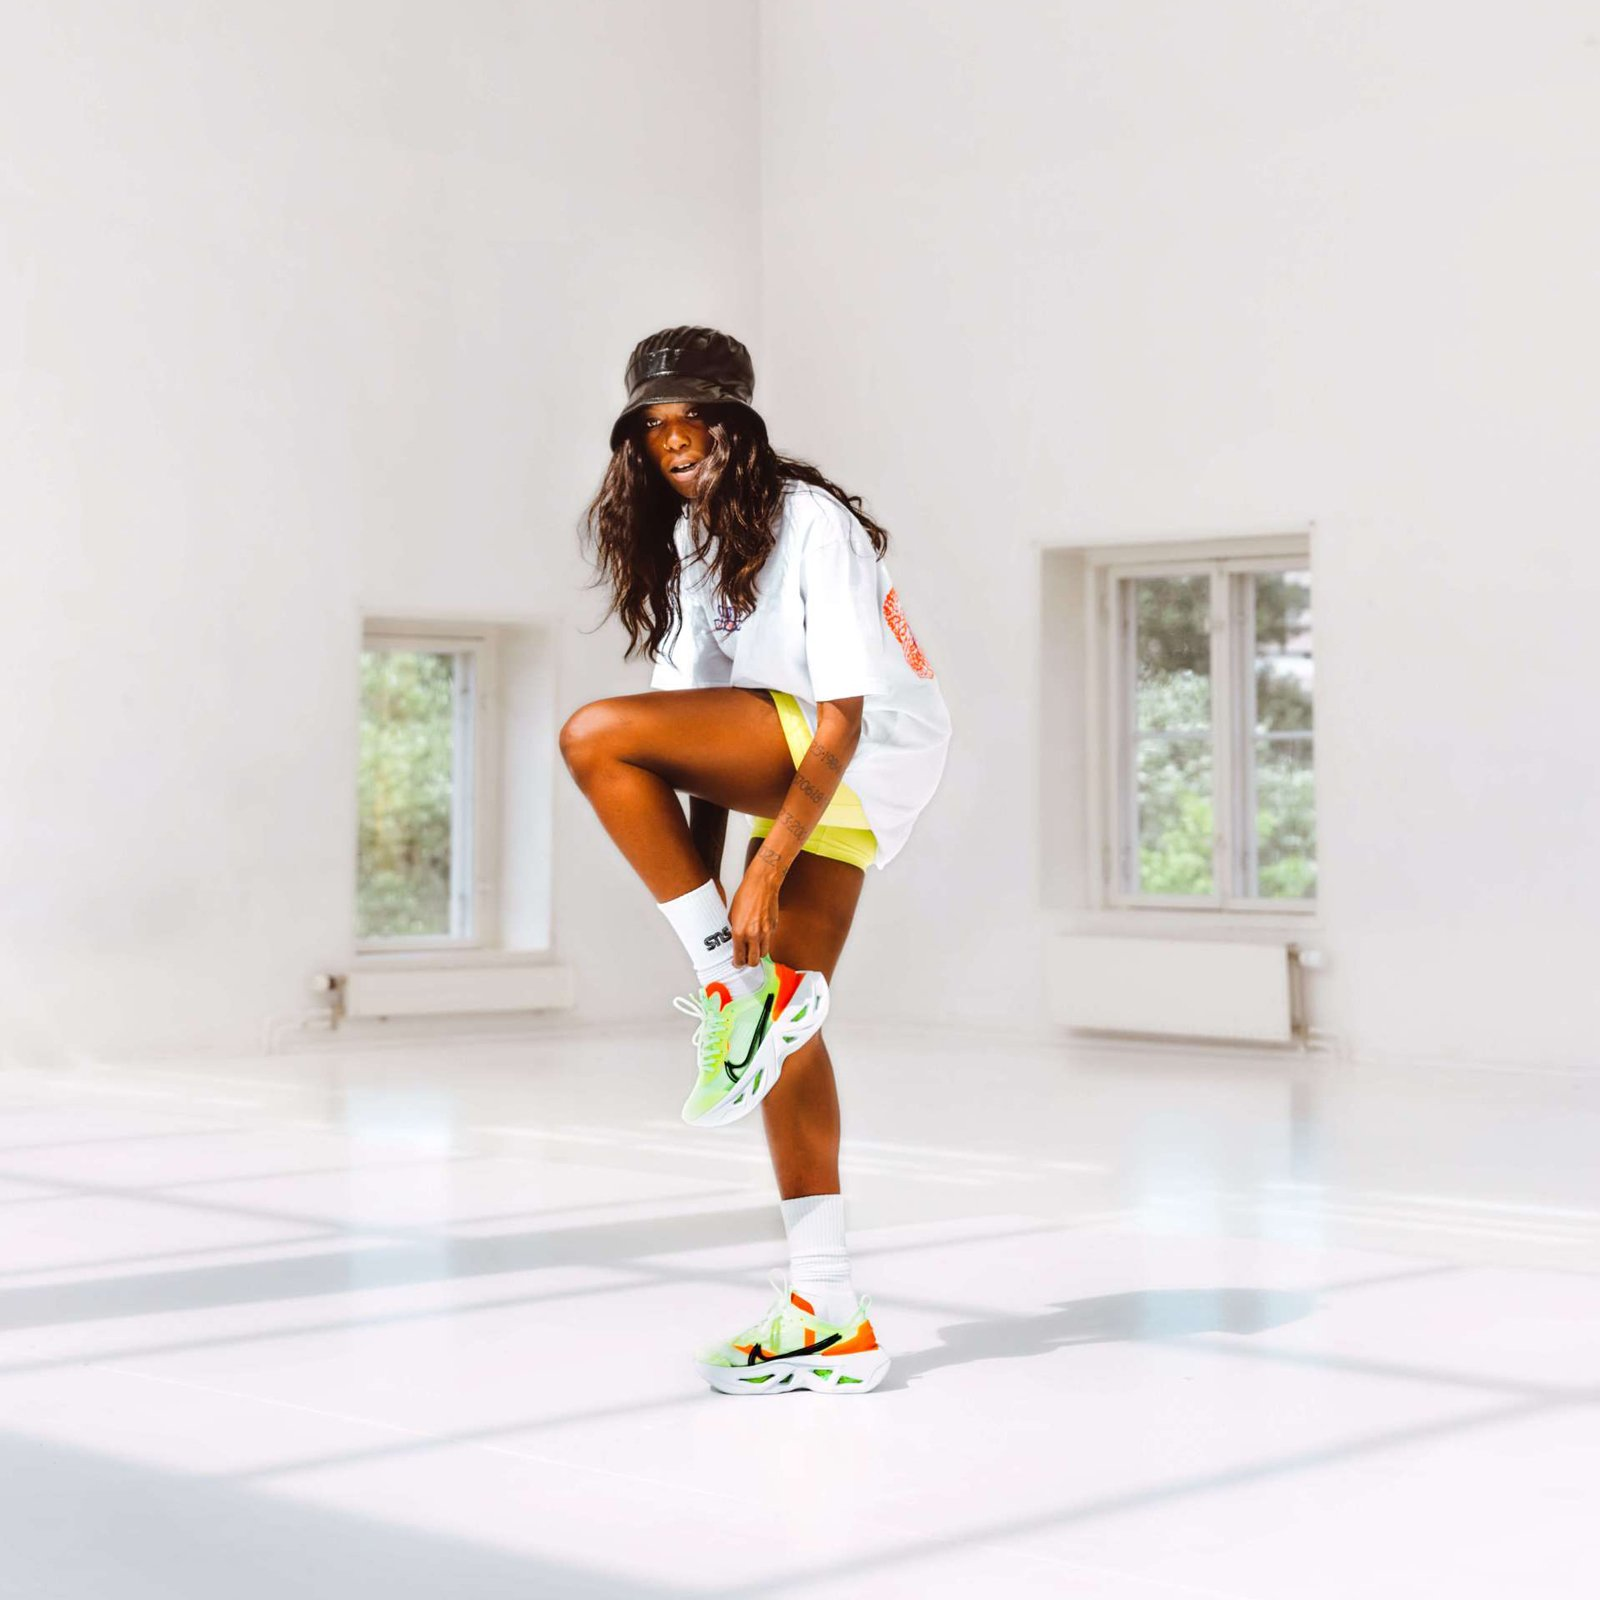 Enajenar ritmo Recuerdo  Nike Zoom X Vista Grind - Bq4800-700 - Sneakersnstuff | sneakers &  streetwear online since 1999